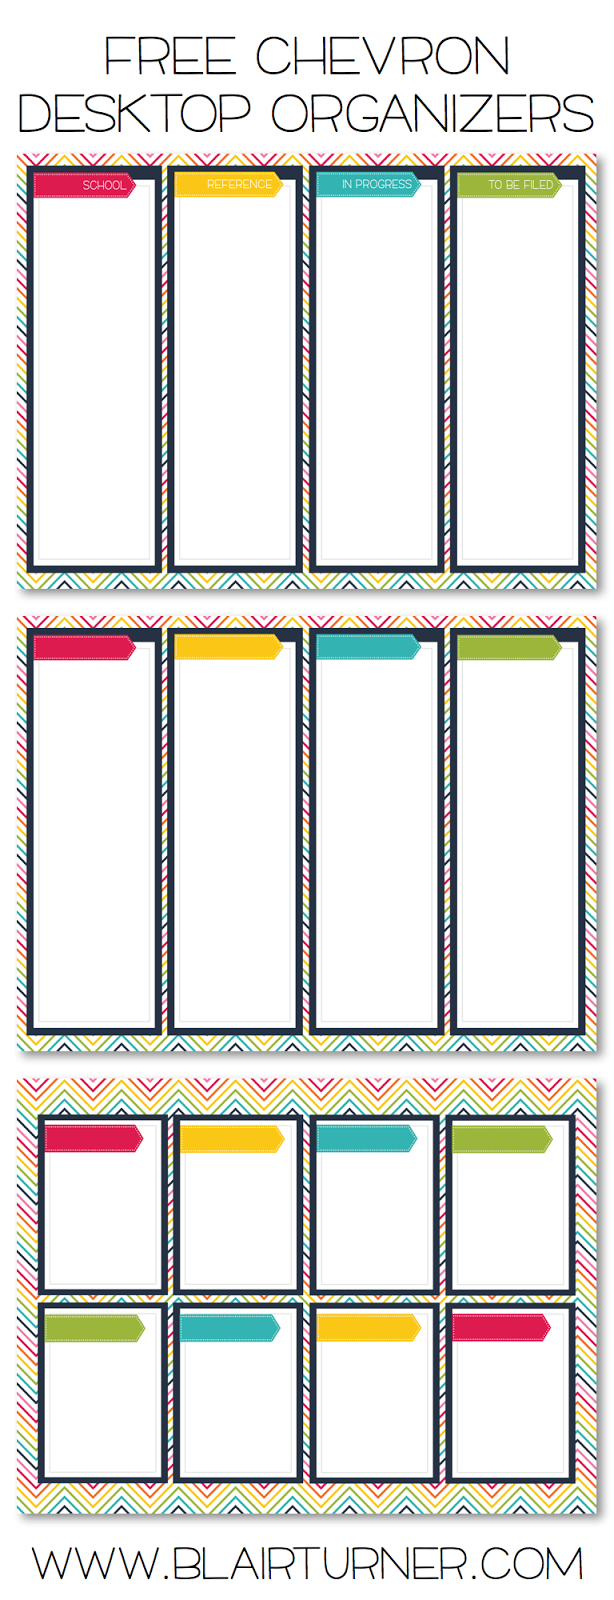 Chevron-Organizational-Desktop-FREEBIE-DOWNLOAD-wallpaper-wp4003909-1